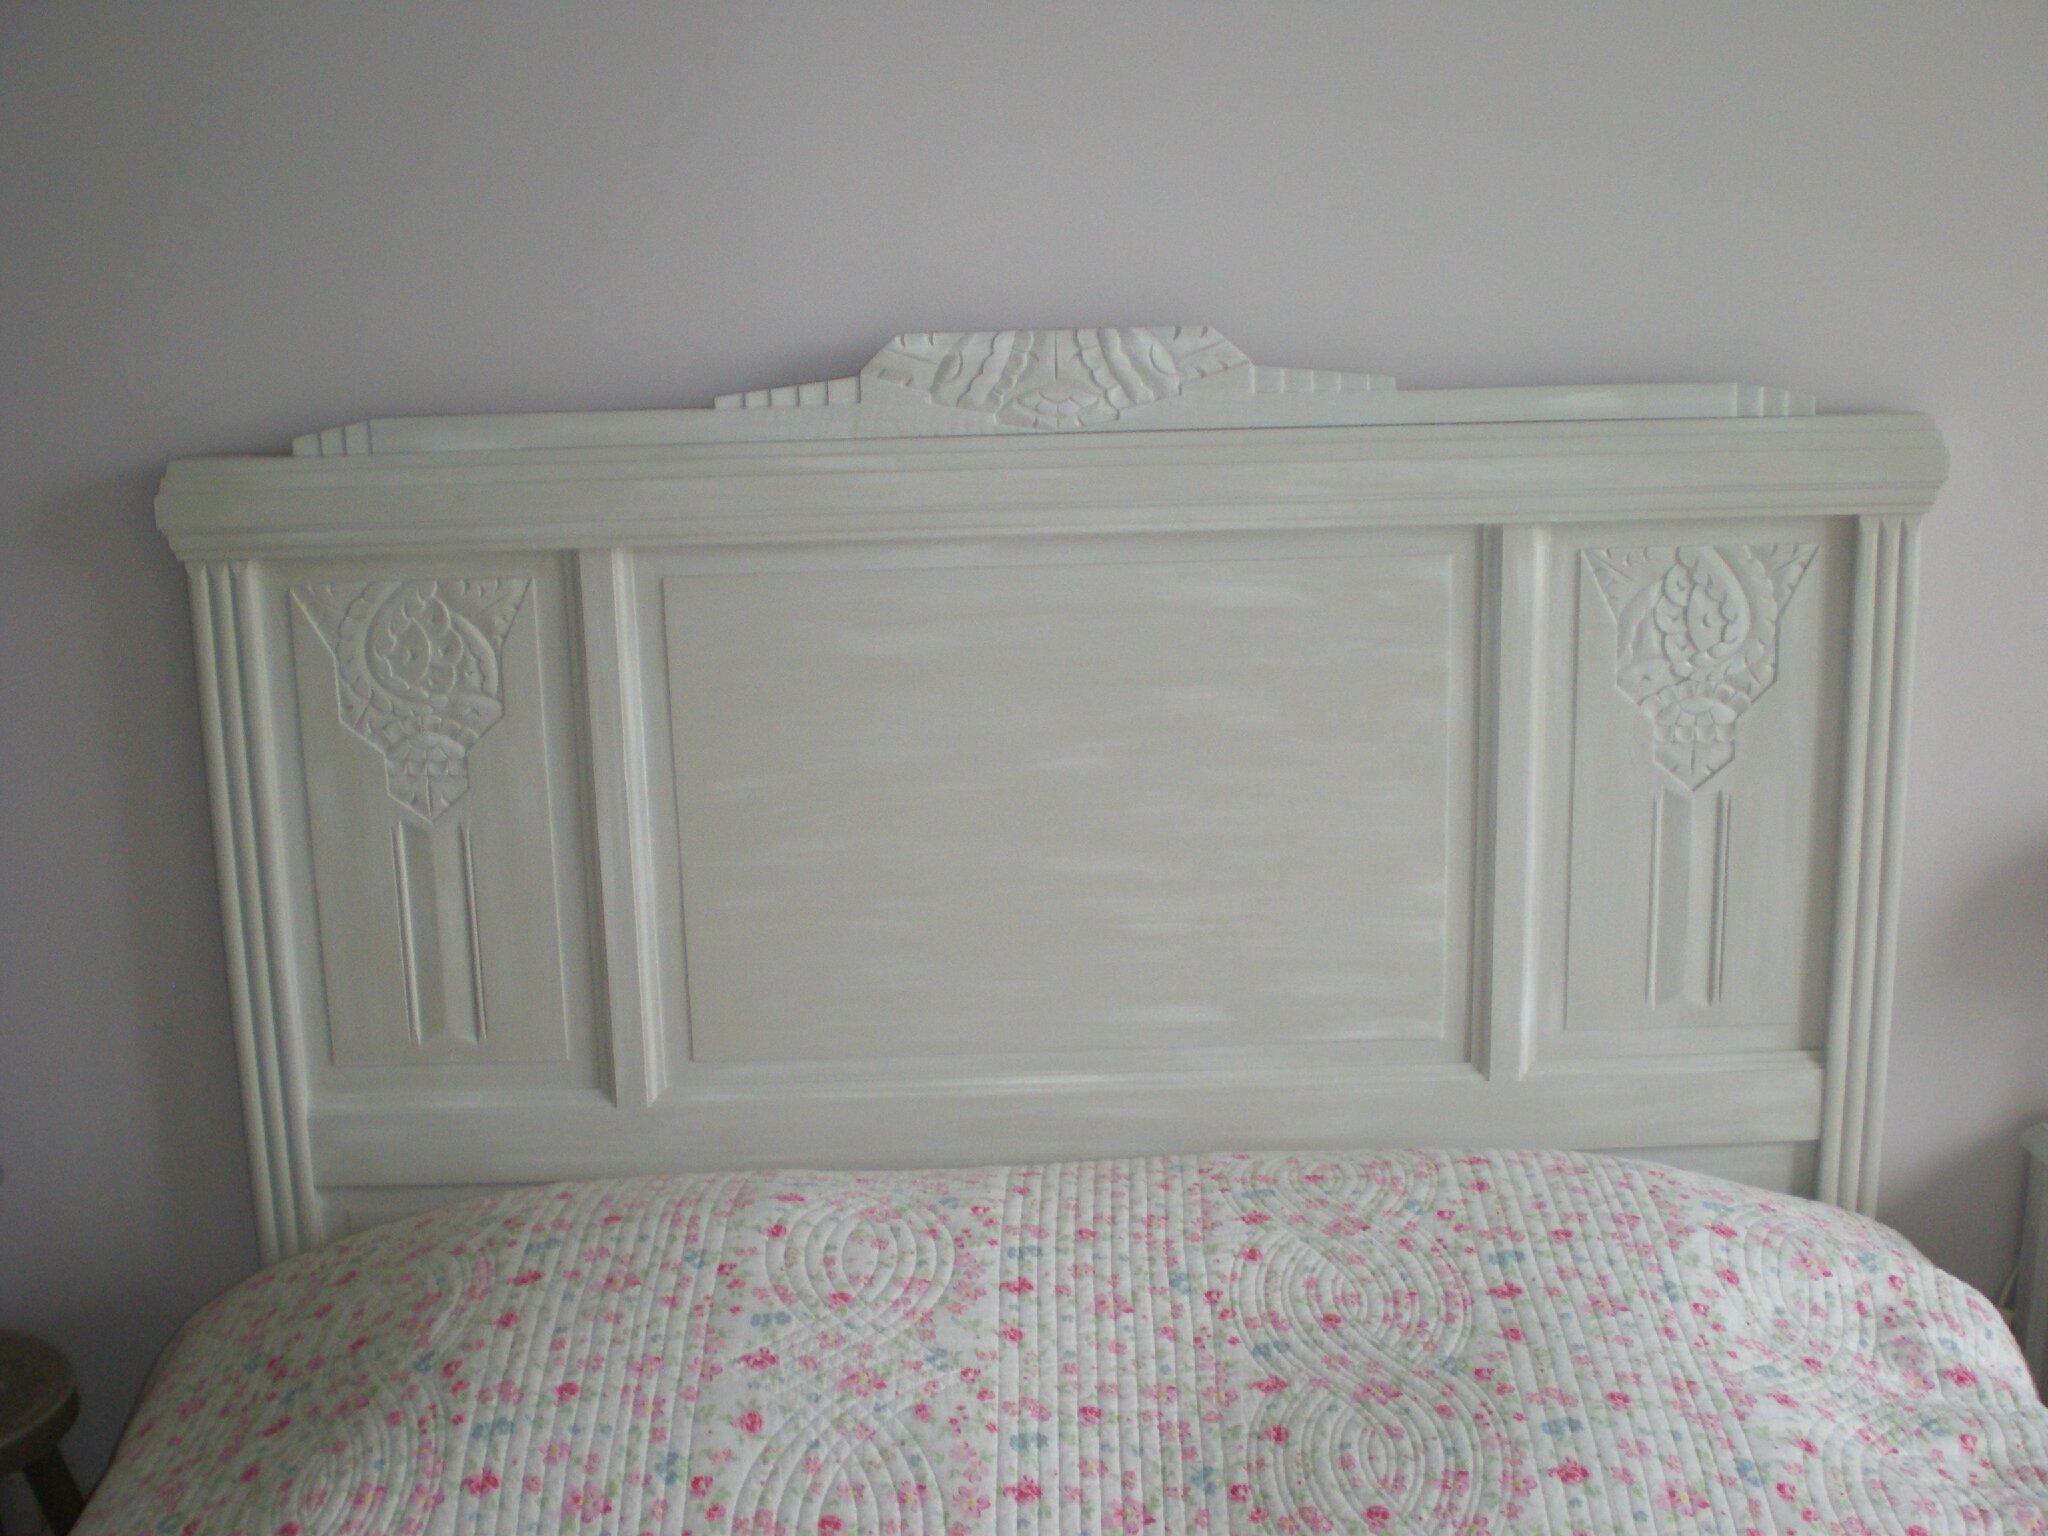 une chambree annees 50 nature cama eu relooking de meubles. Black Bedroom Furniture Sets. Home Design Ideas